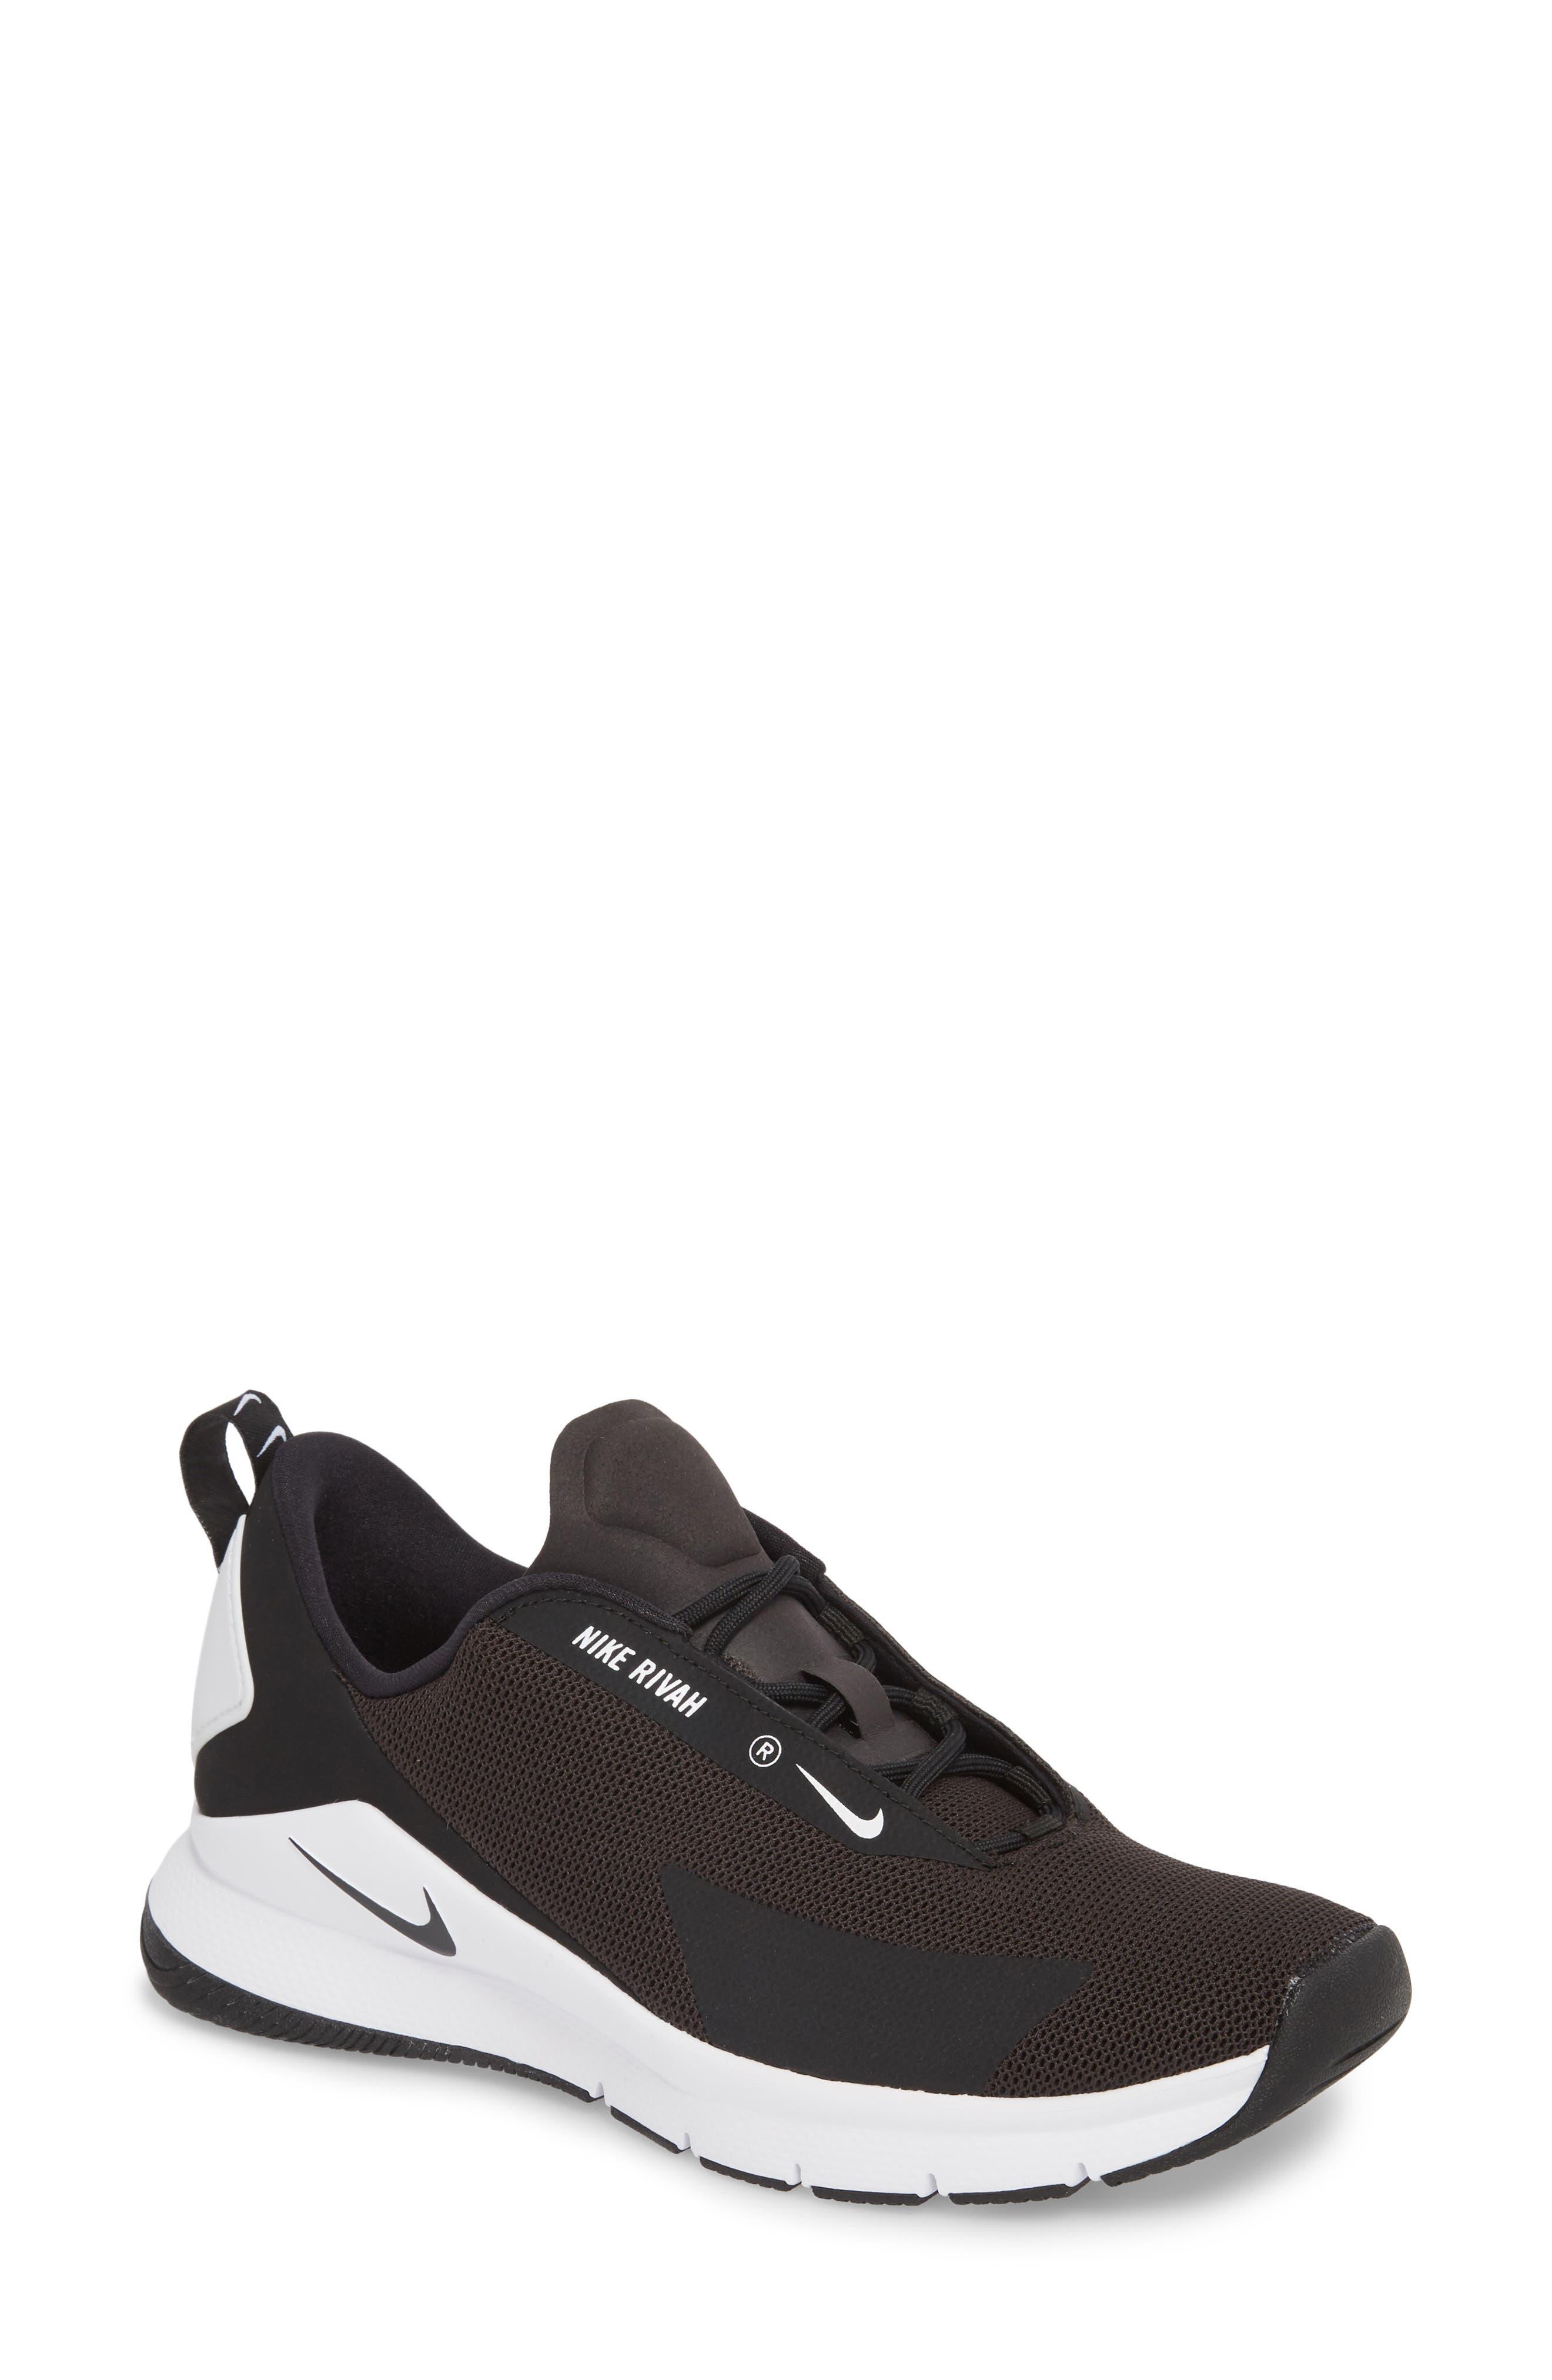 Rivah Sneaker,                             Main thumbnail 1, color,                             004